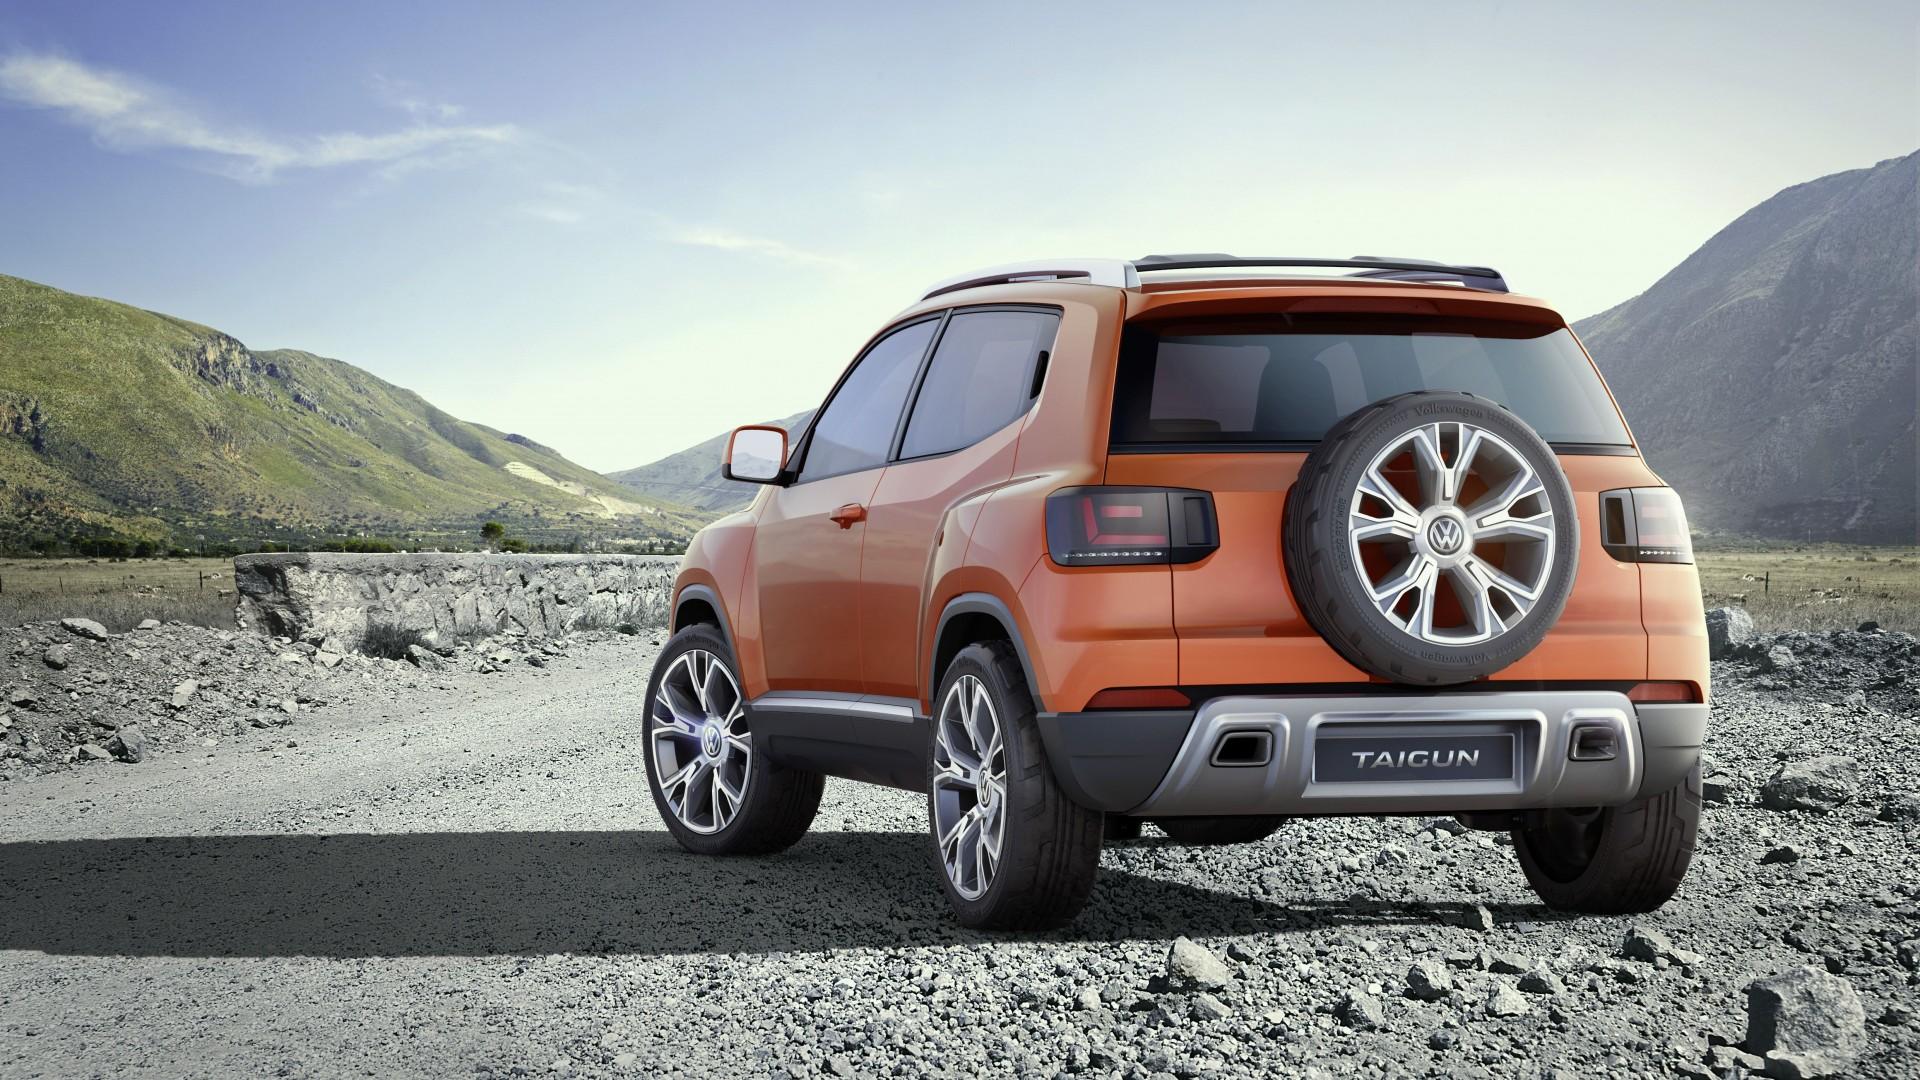 wallpaper volkswagen taigun crossover volkswagen suv 2015 cars test drive review buy. Black Bedroom Furniture Sets. Home Design Ideas